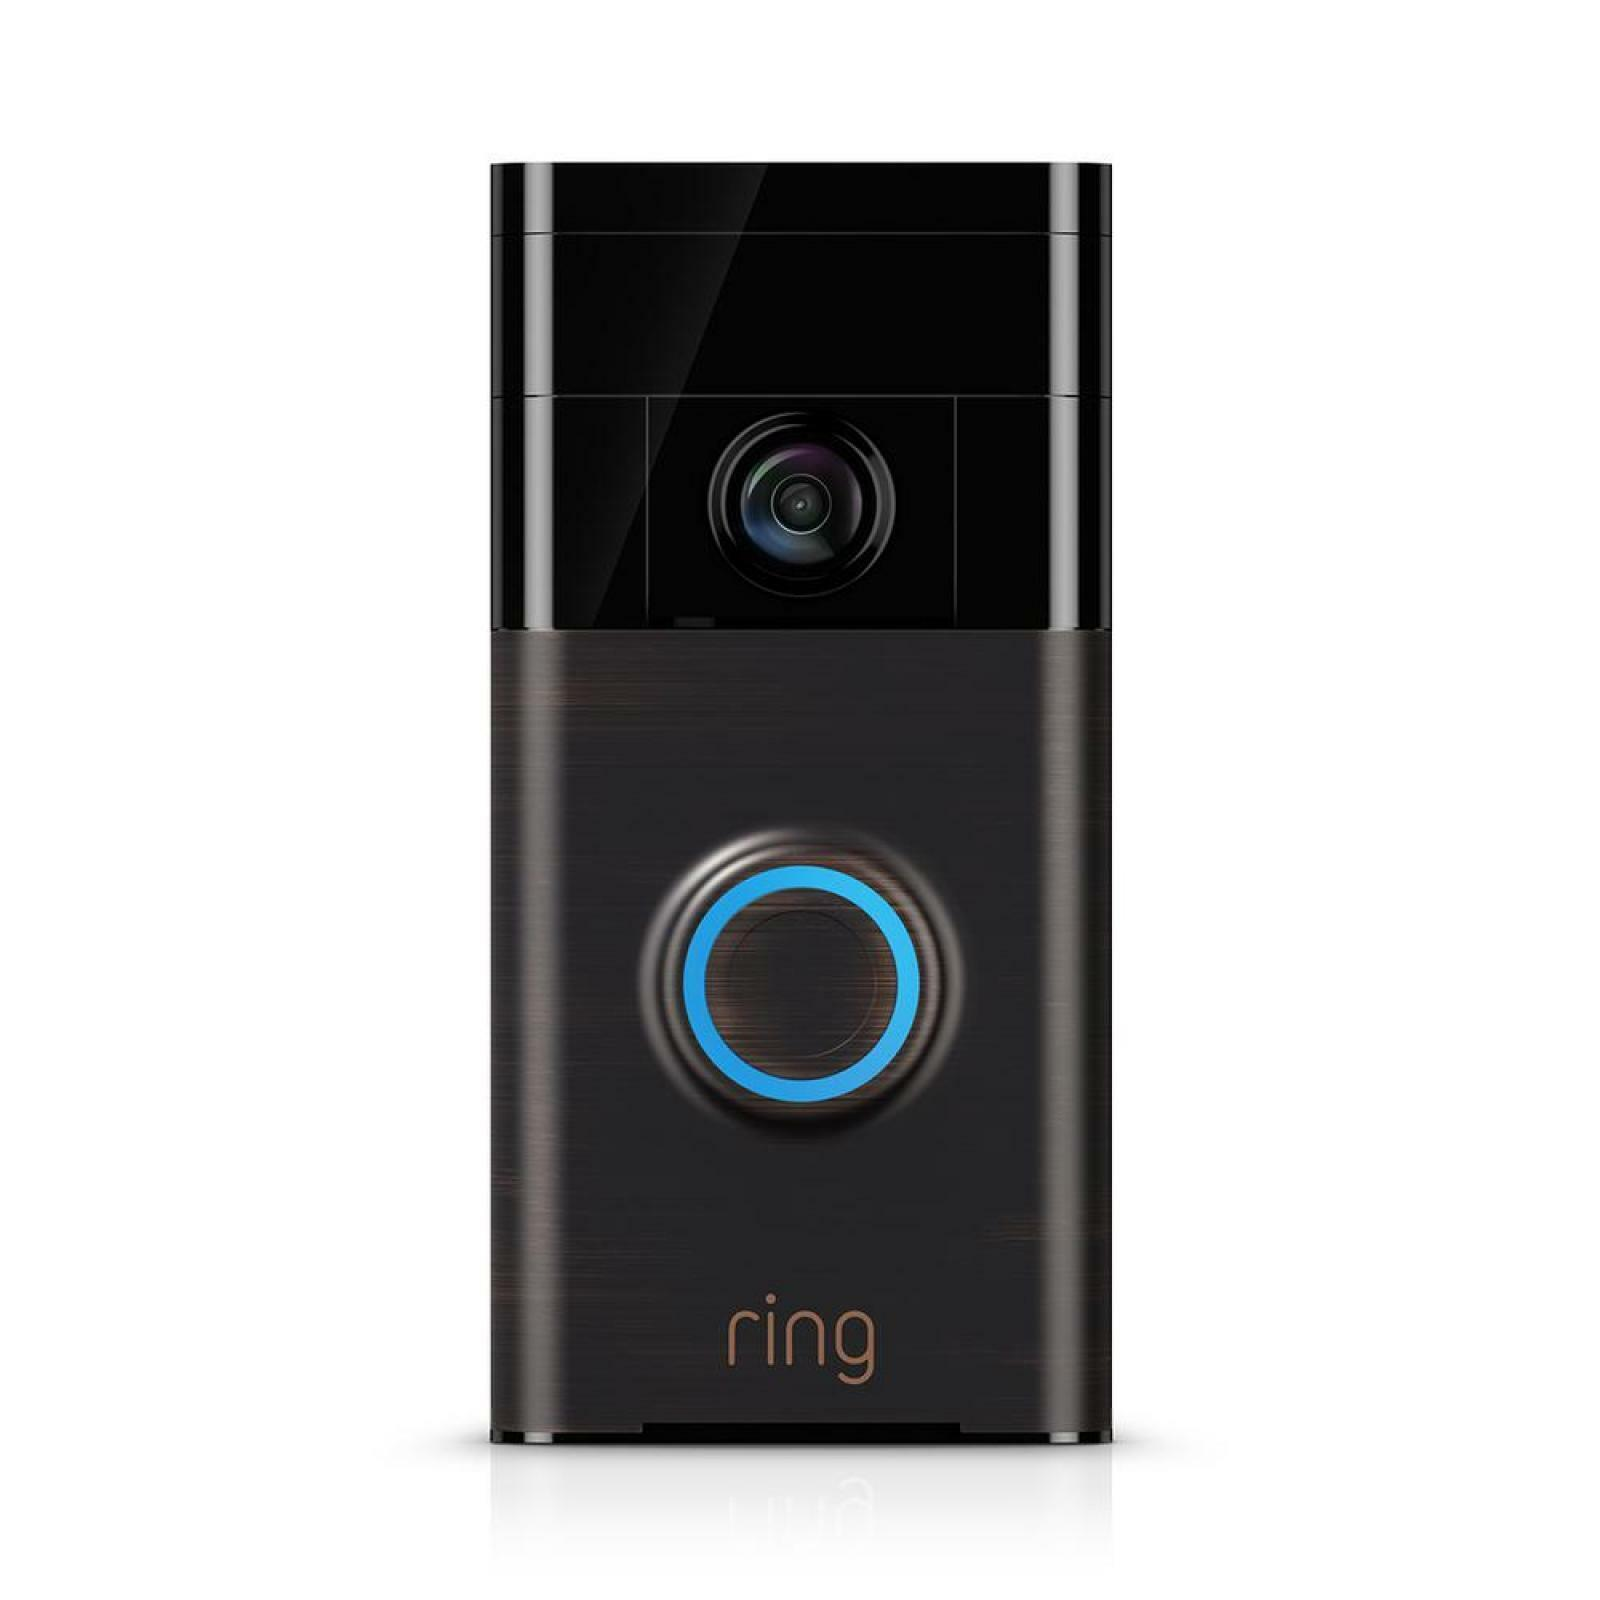 Ring Wireless Video Doorbell Motion Sensor 2 Way Talk Loud Alarm iOS Android App